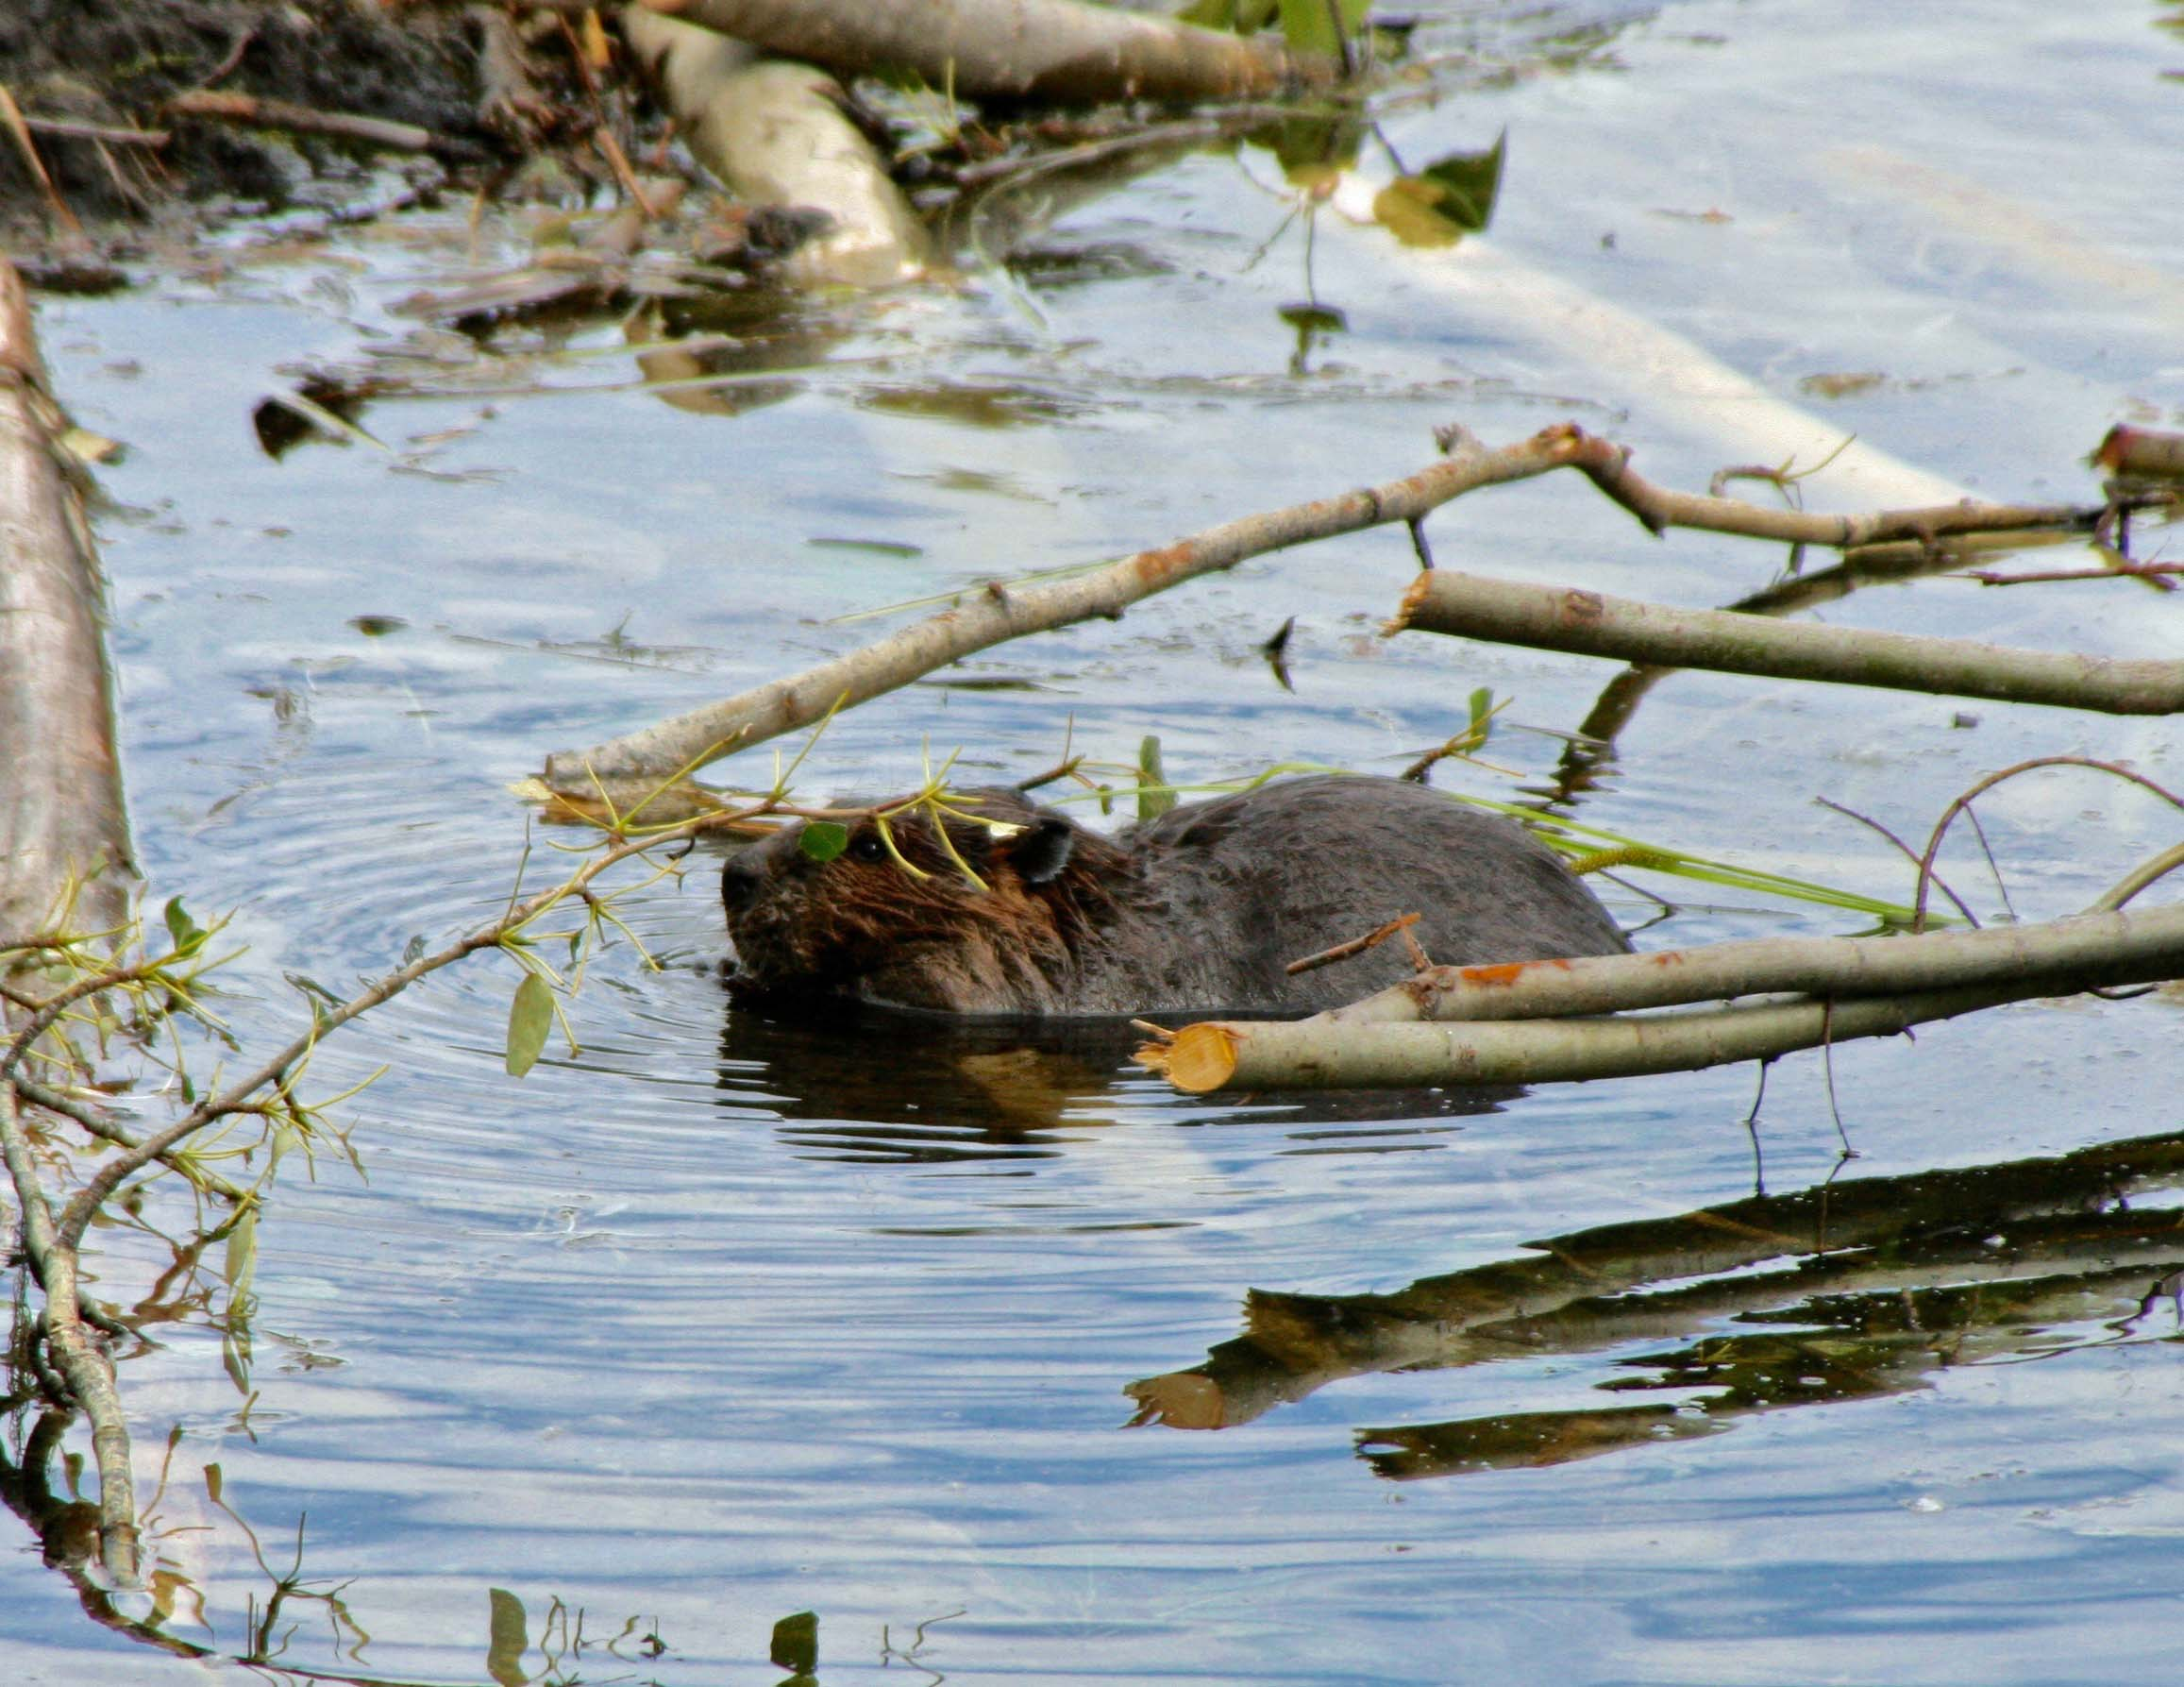 Beaver working on beaver dam